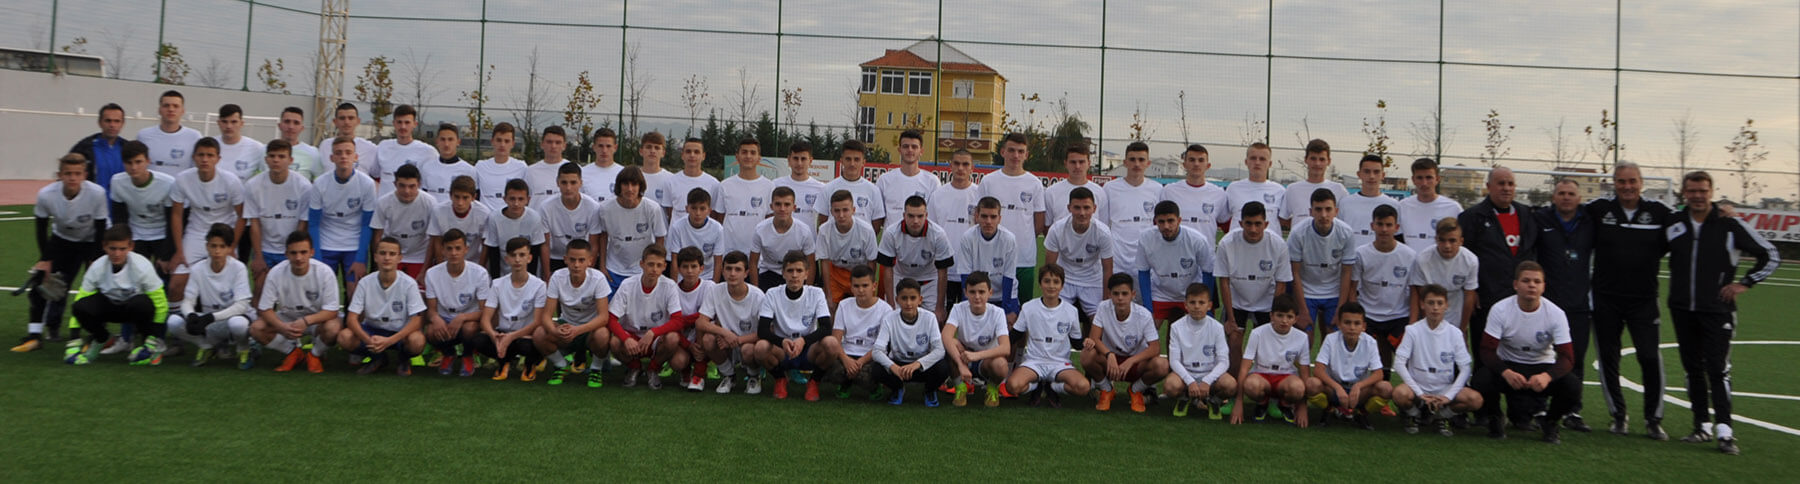 soccercampalbania